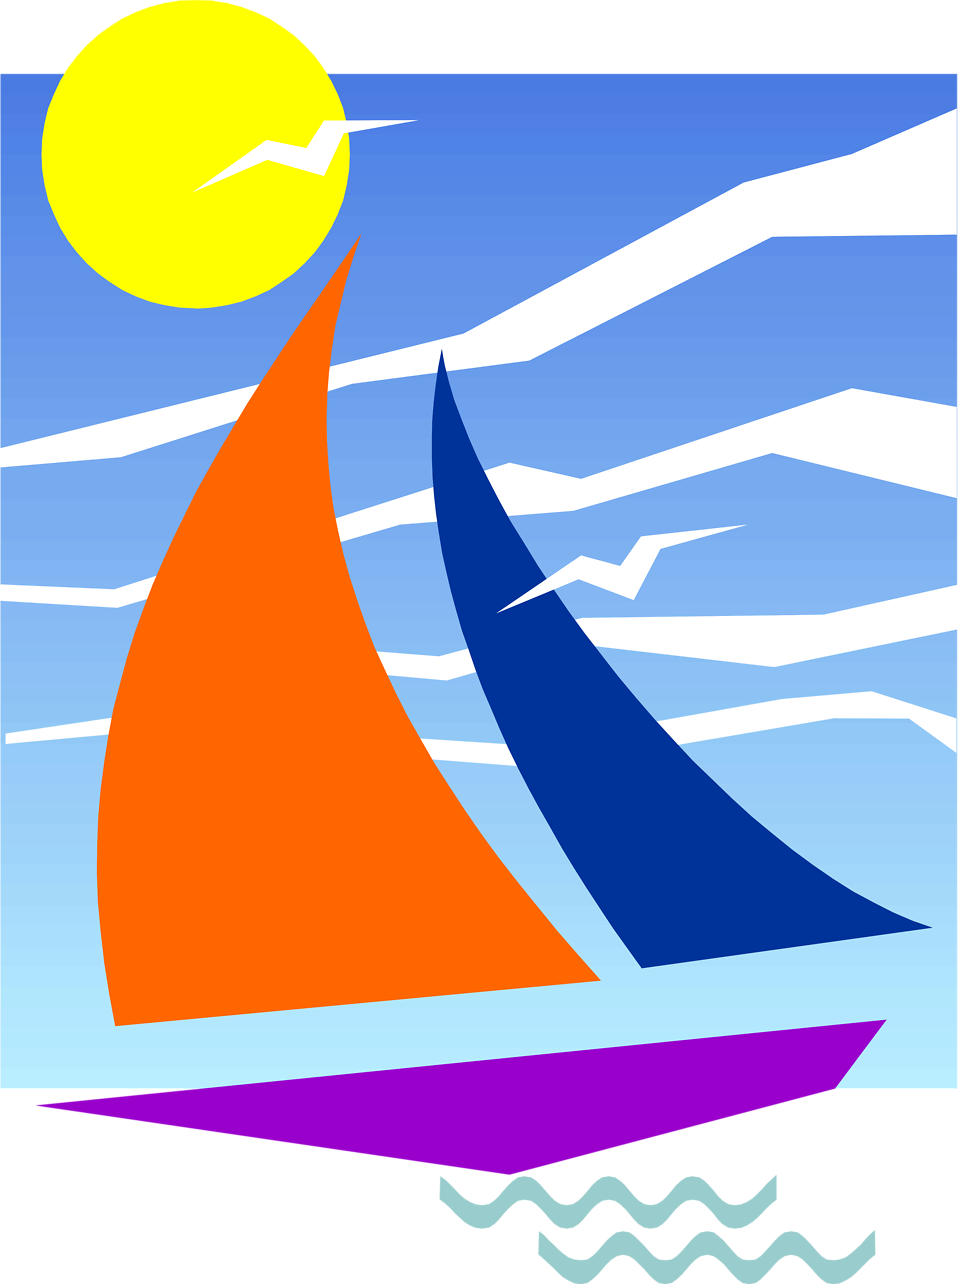 Clipart sun ocean. Sailboat free stock photo